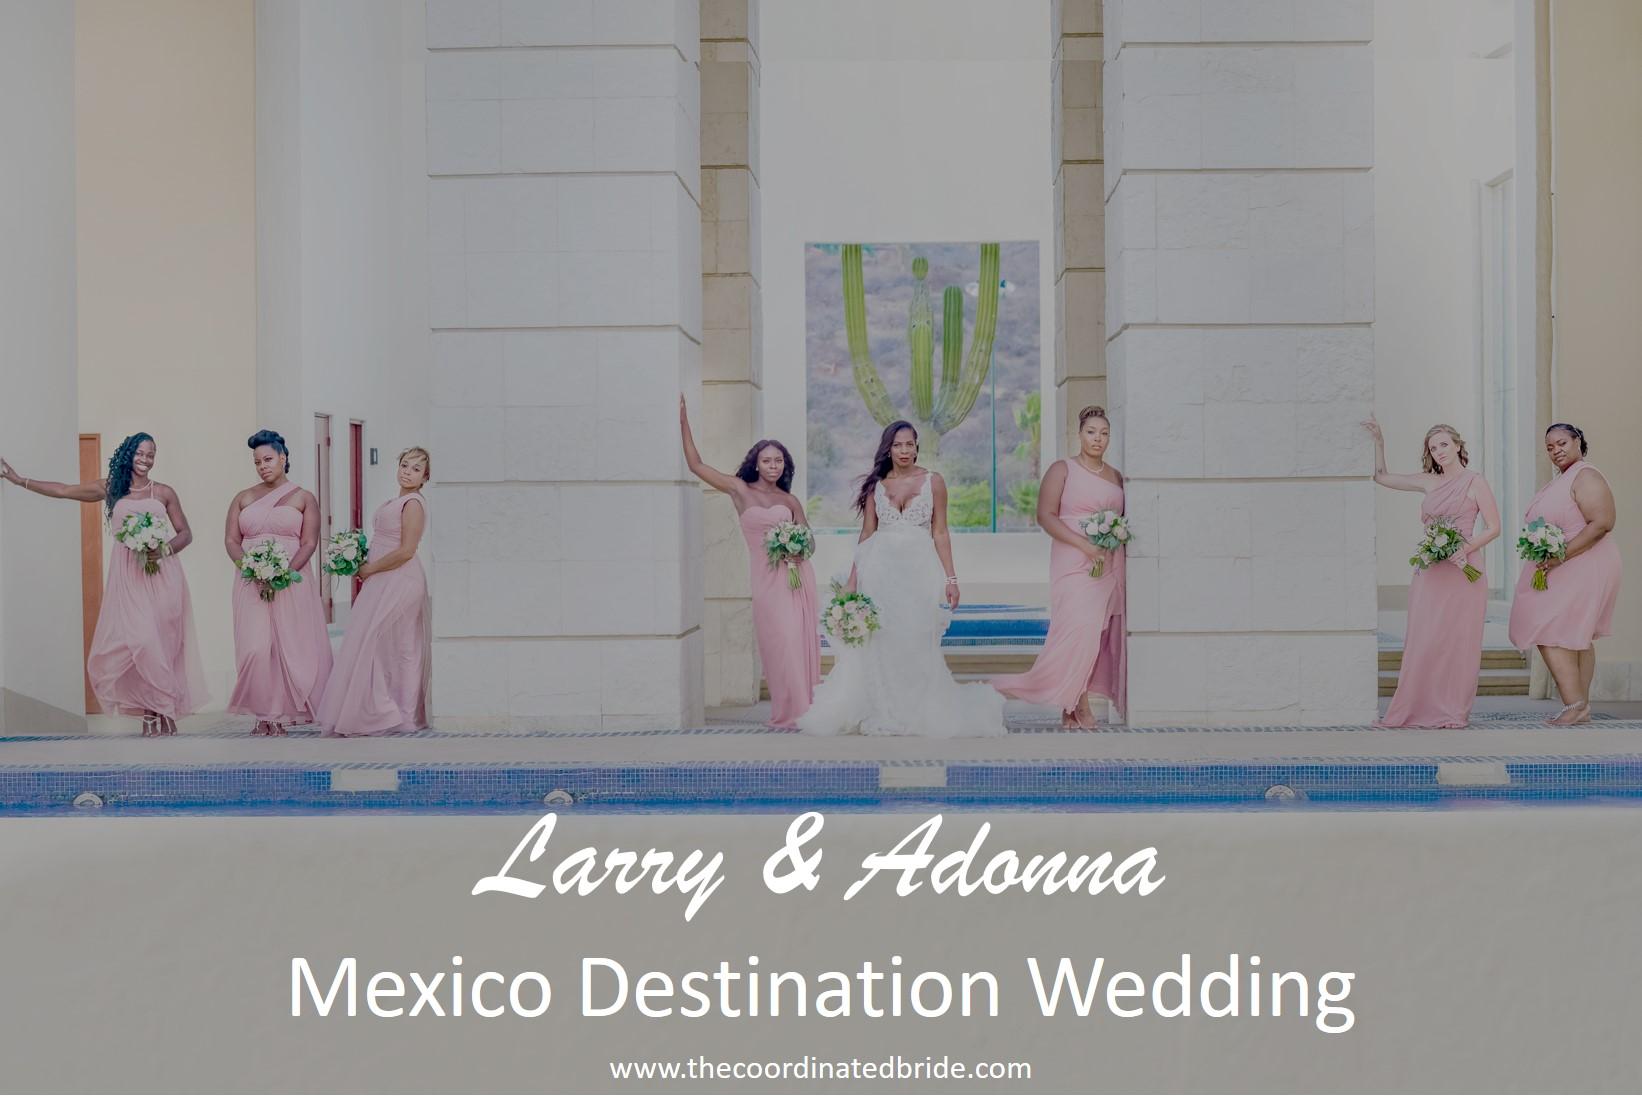 A Mexico Destination Wedding, Larry & Adonna